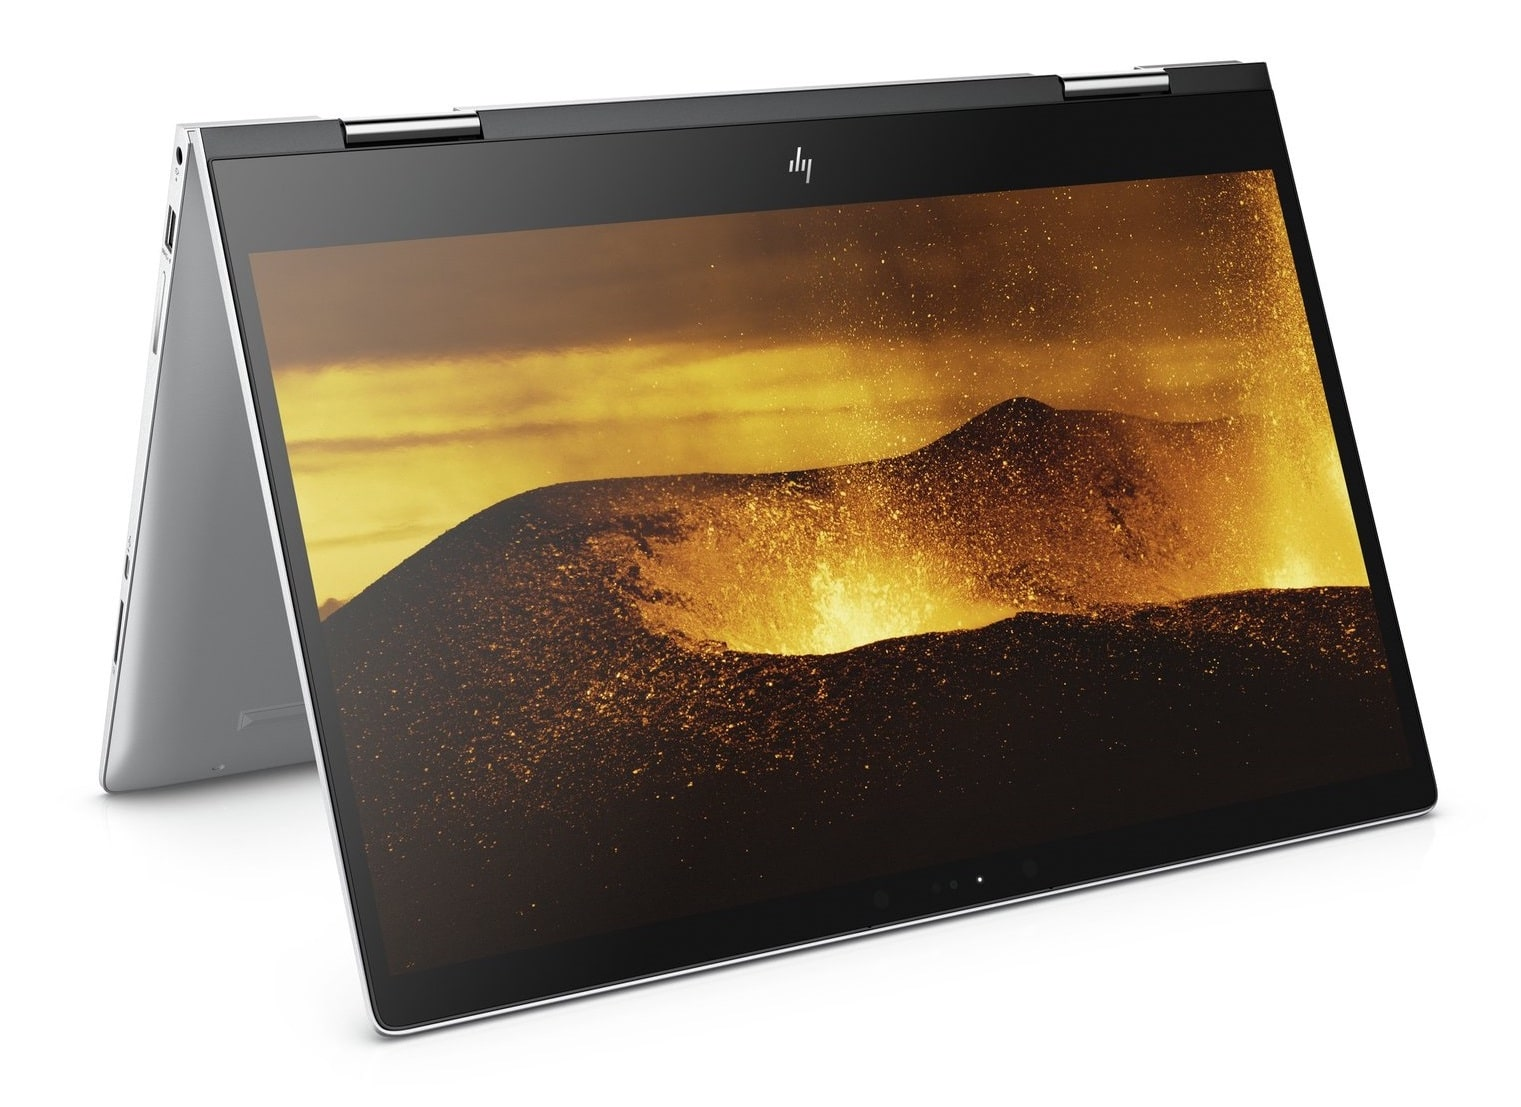 "HP Envy x360 15-bp002nf, ultrabook 15"" tablette 4K i7 Kaby 940MX SSD/HDD 1614€"